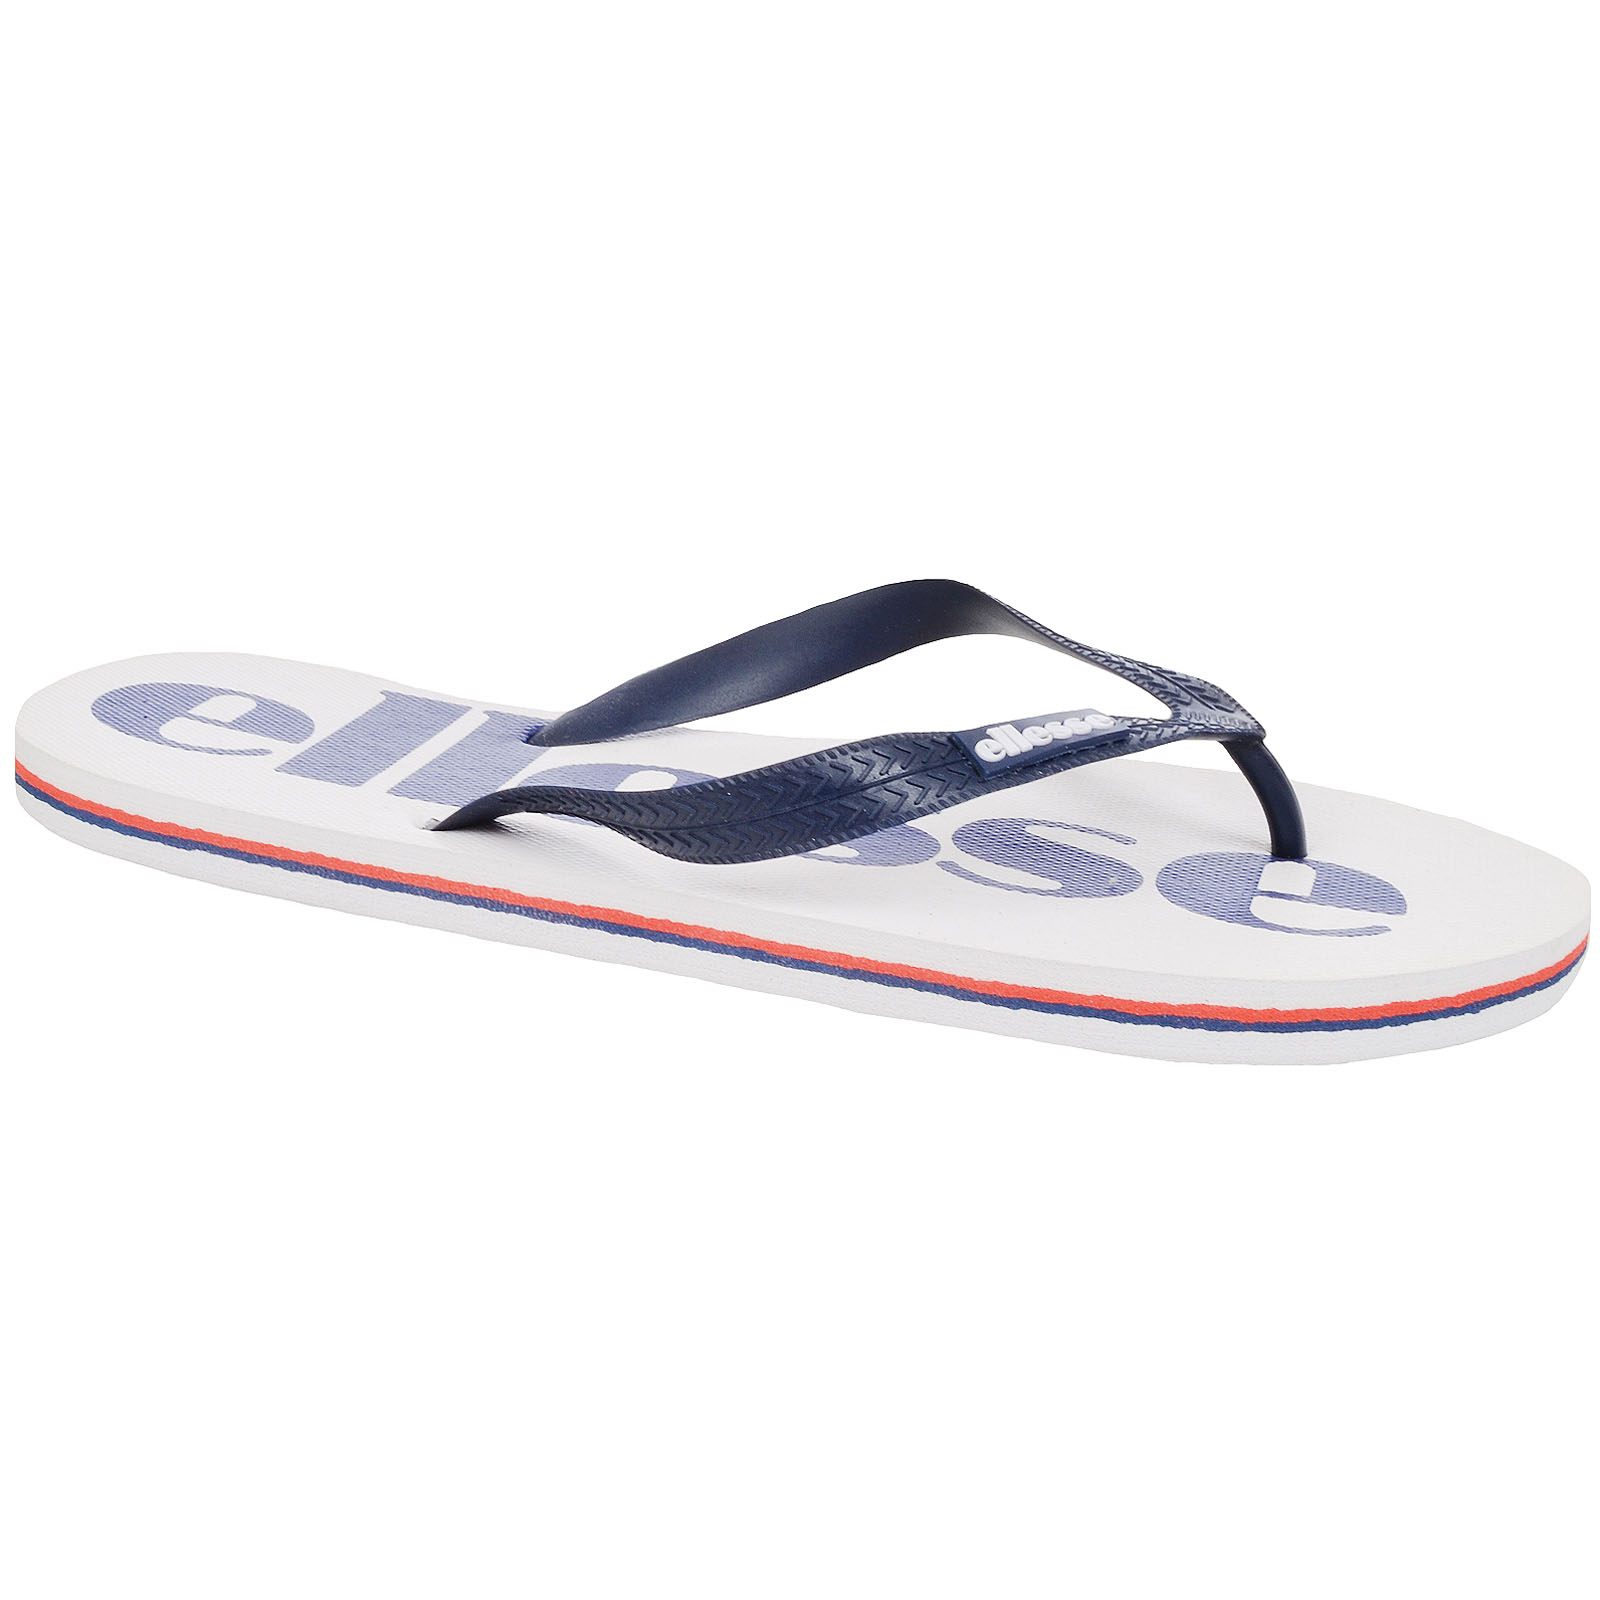 Ellesse-Mens-Marcos-Flip-Flops-Beach-Pool-Holiday-Slip-On-Sandals-Thongs thumbnail 19